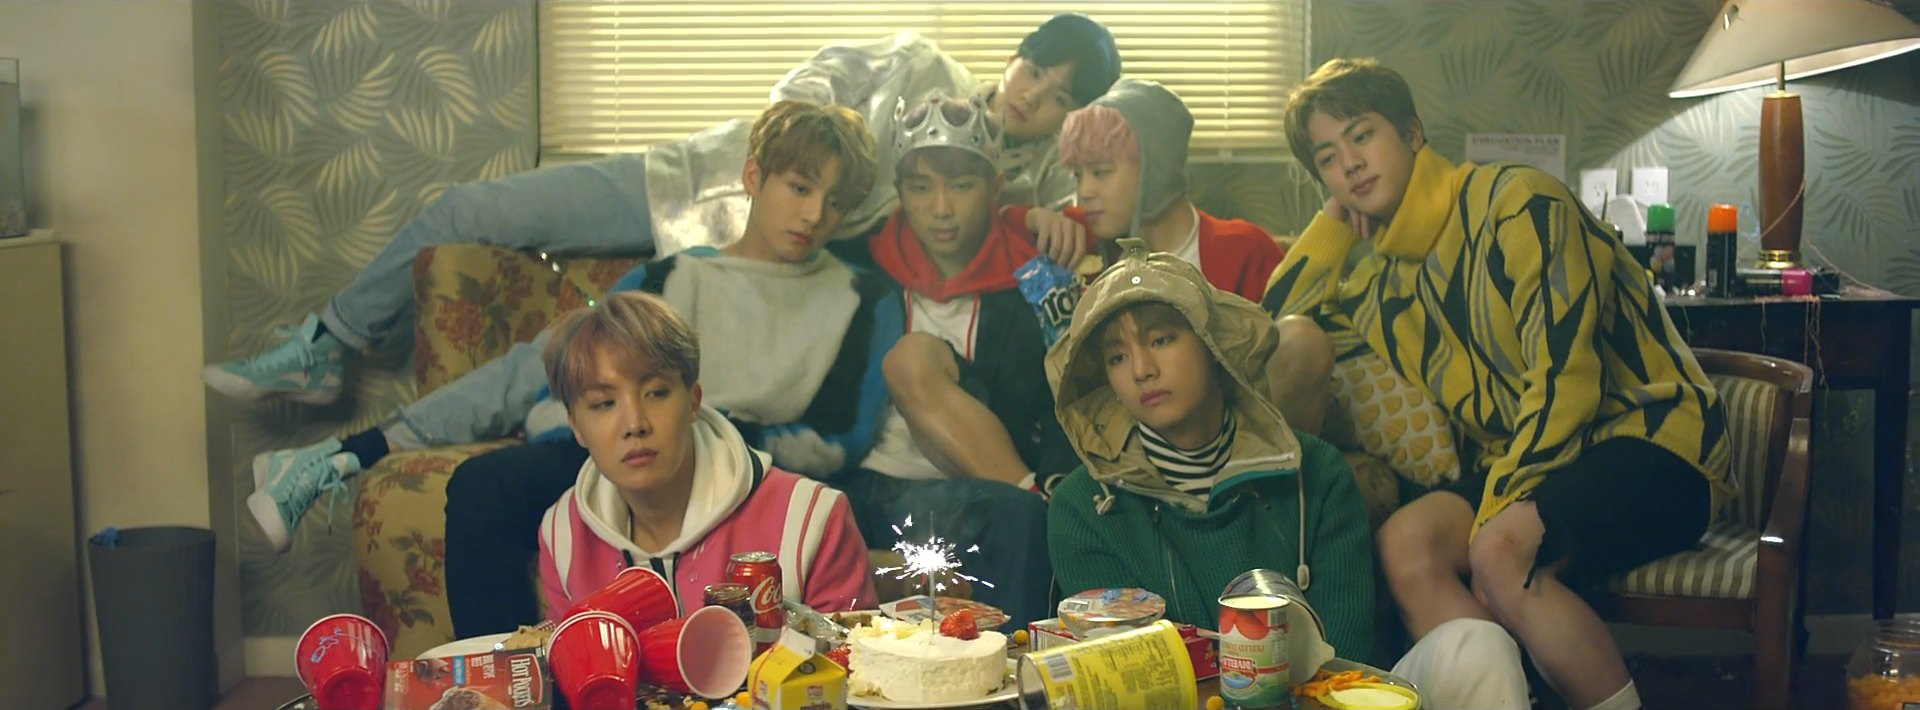 BTS Spring Day 방탄소년단 봄날